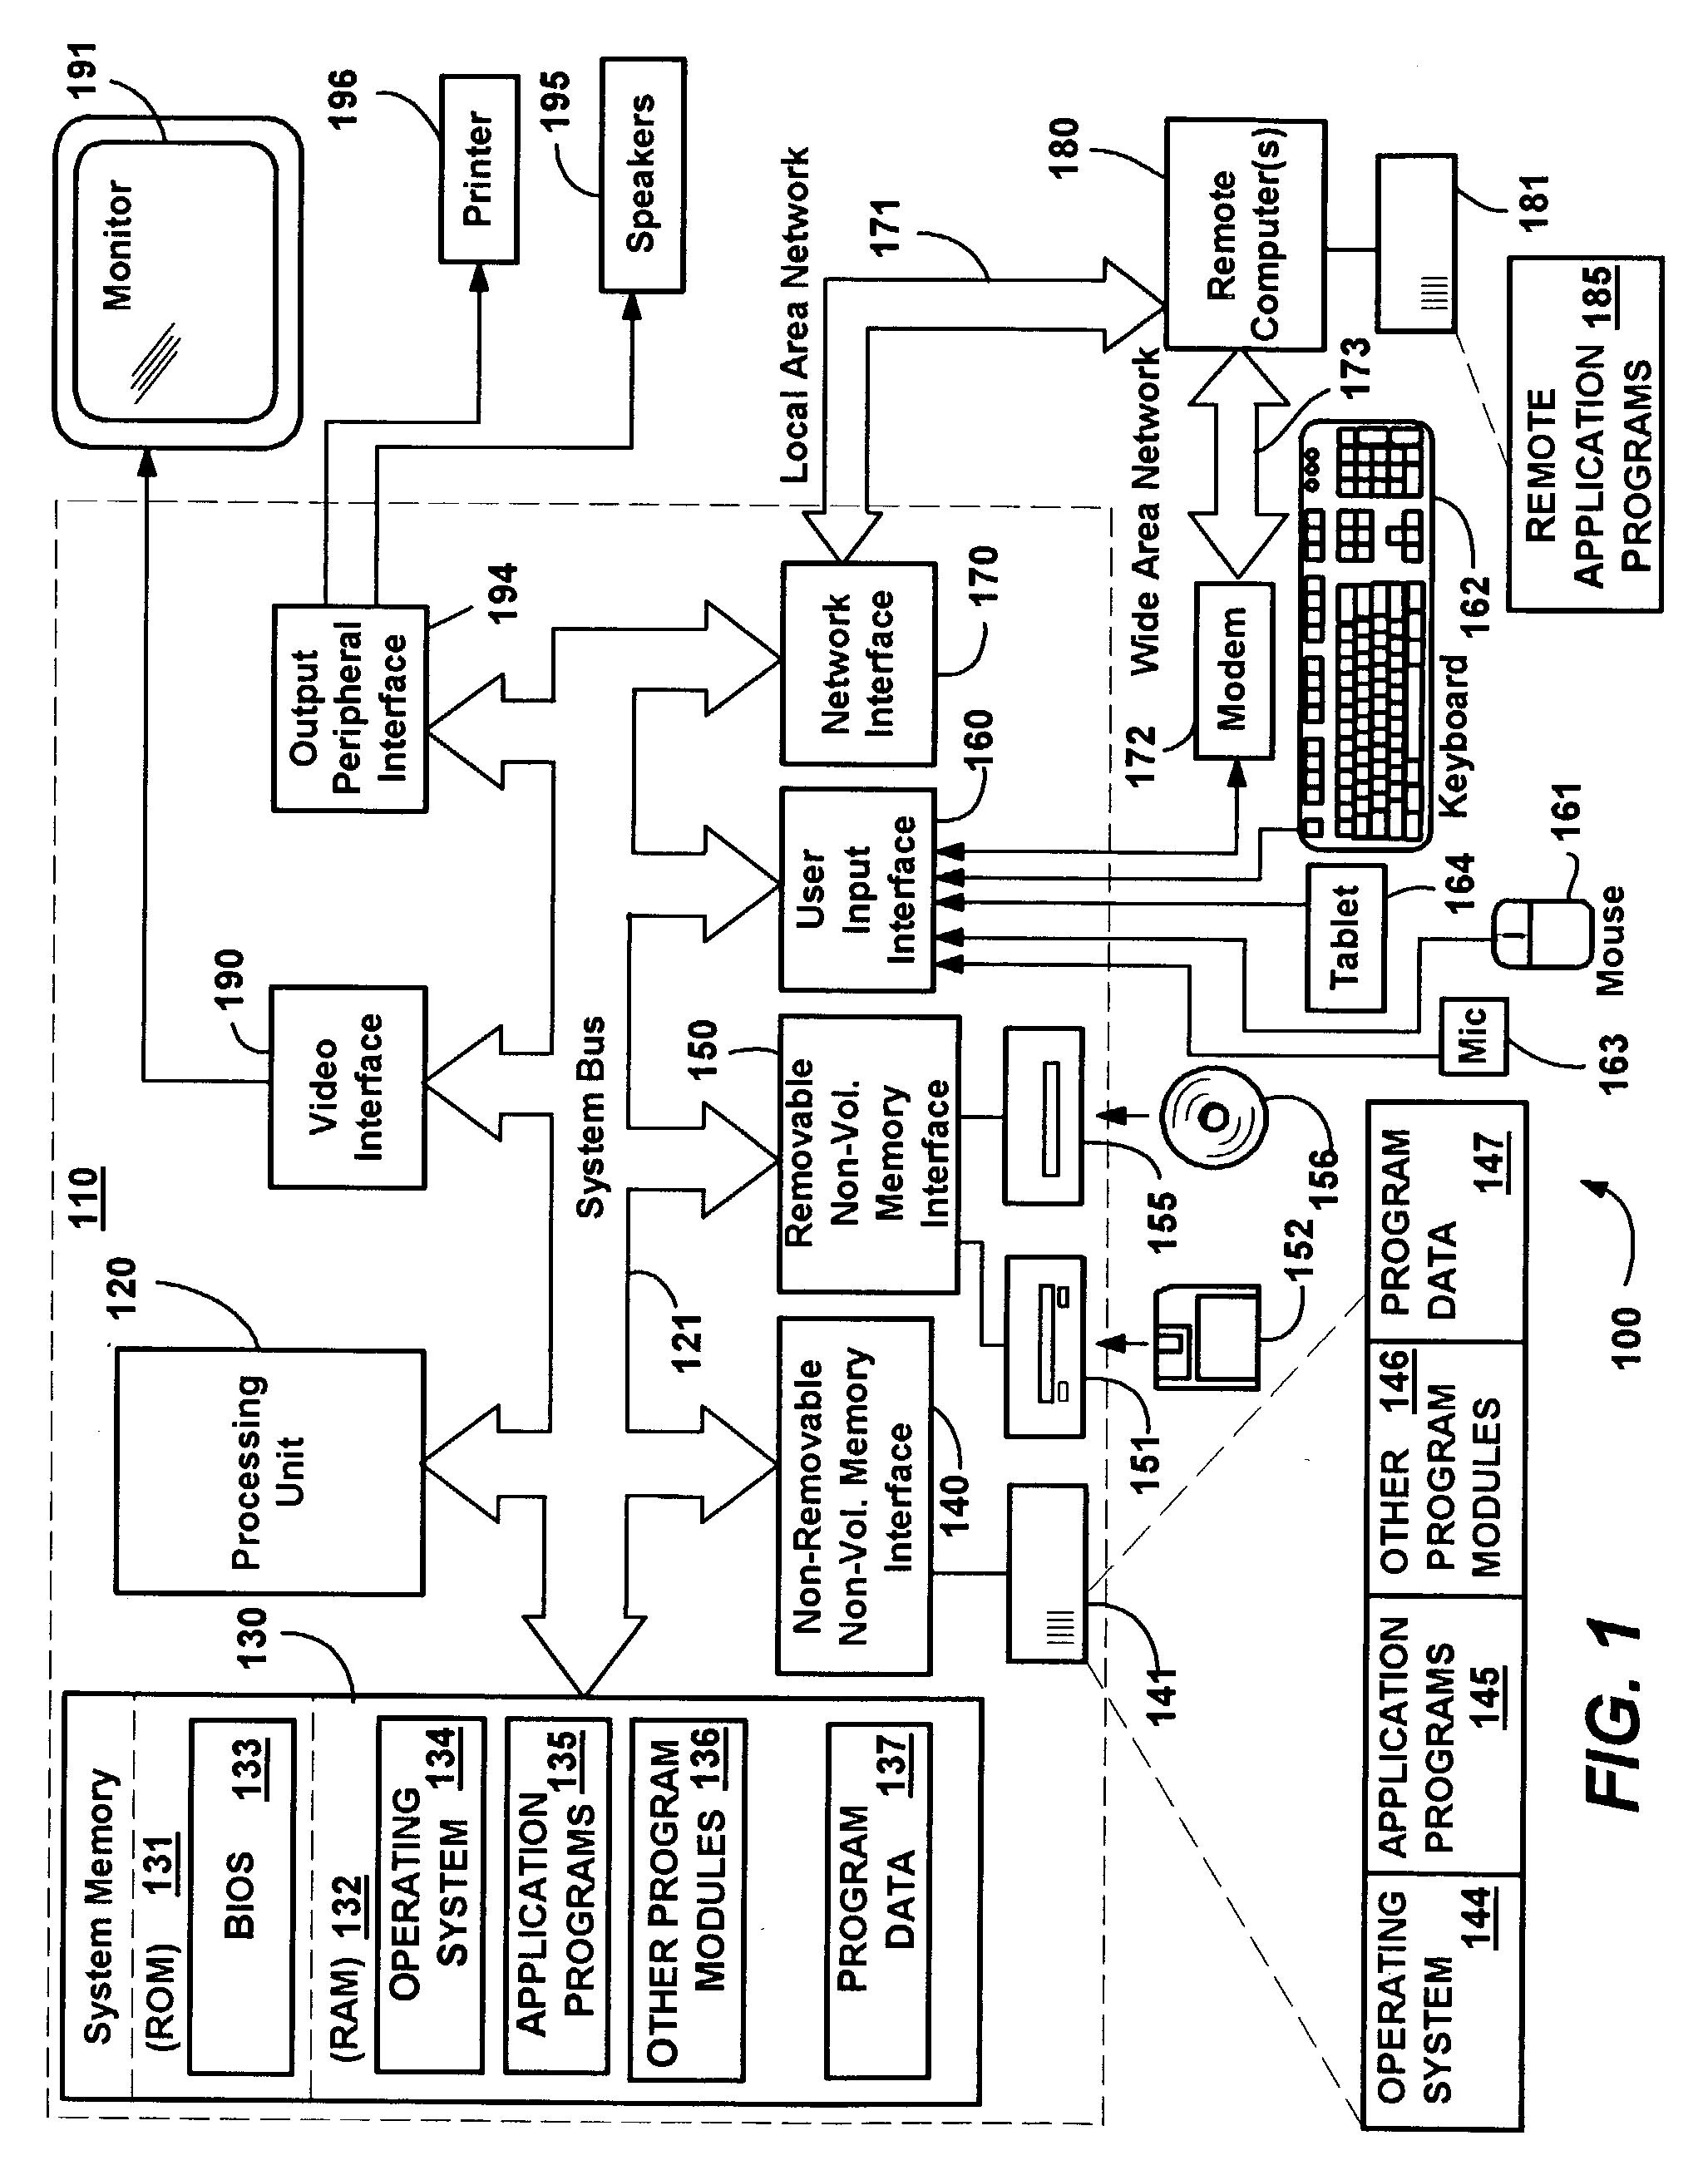 [QNCB_7524]  WF_3556] Nexon Car Alarm Wiring Diagram Wiring Diagram | Car Alarm Wiring Diagram Further Also |  | Ungo Skat Peted Phae Mohammedshrine Librar Wiring 101